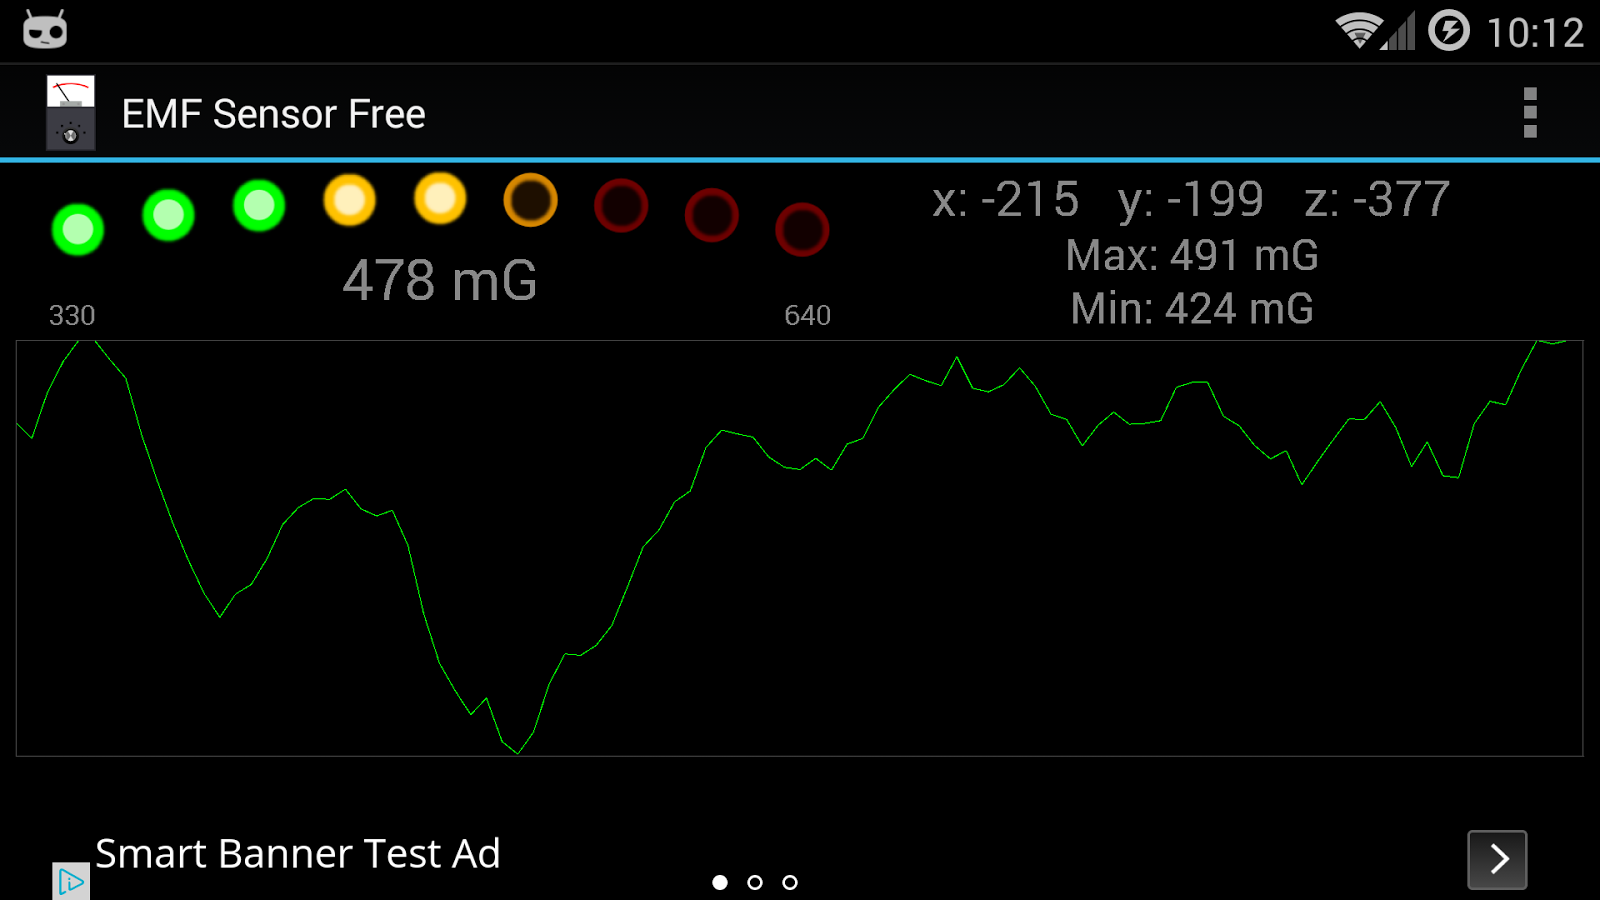 EMF Sensor Free - screenshot